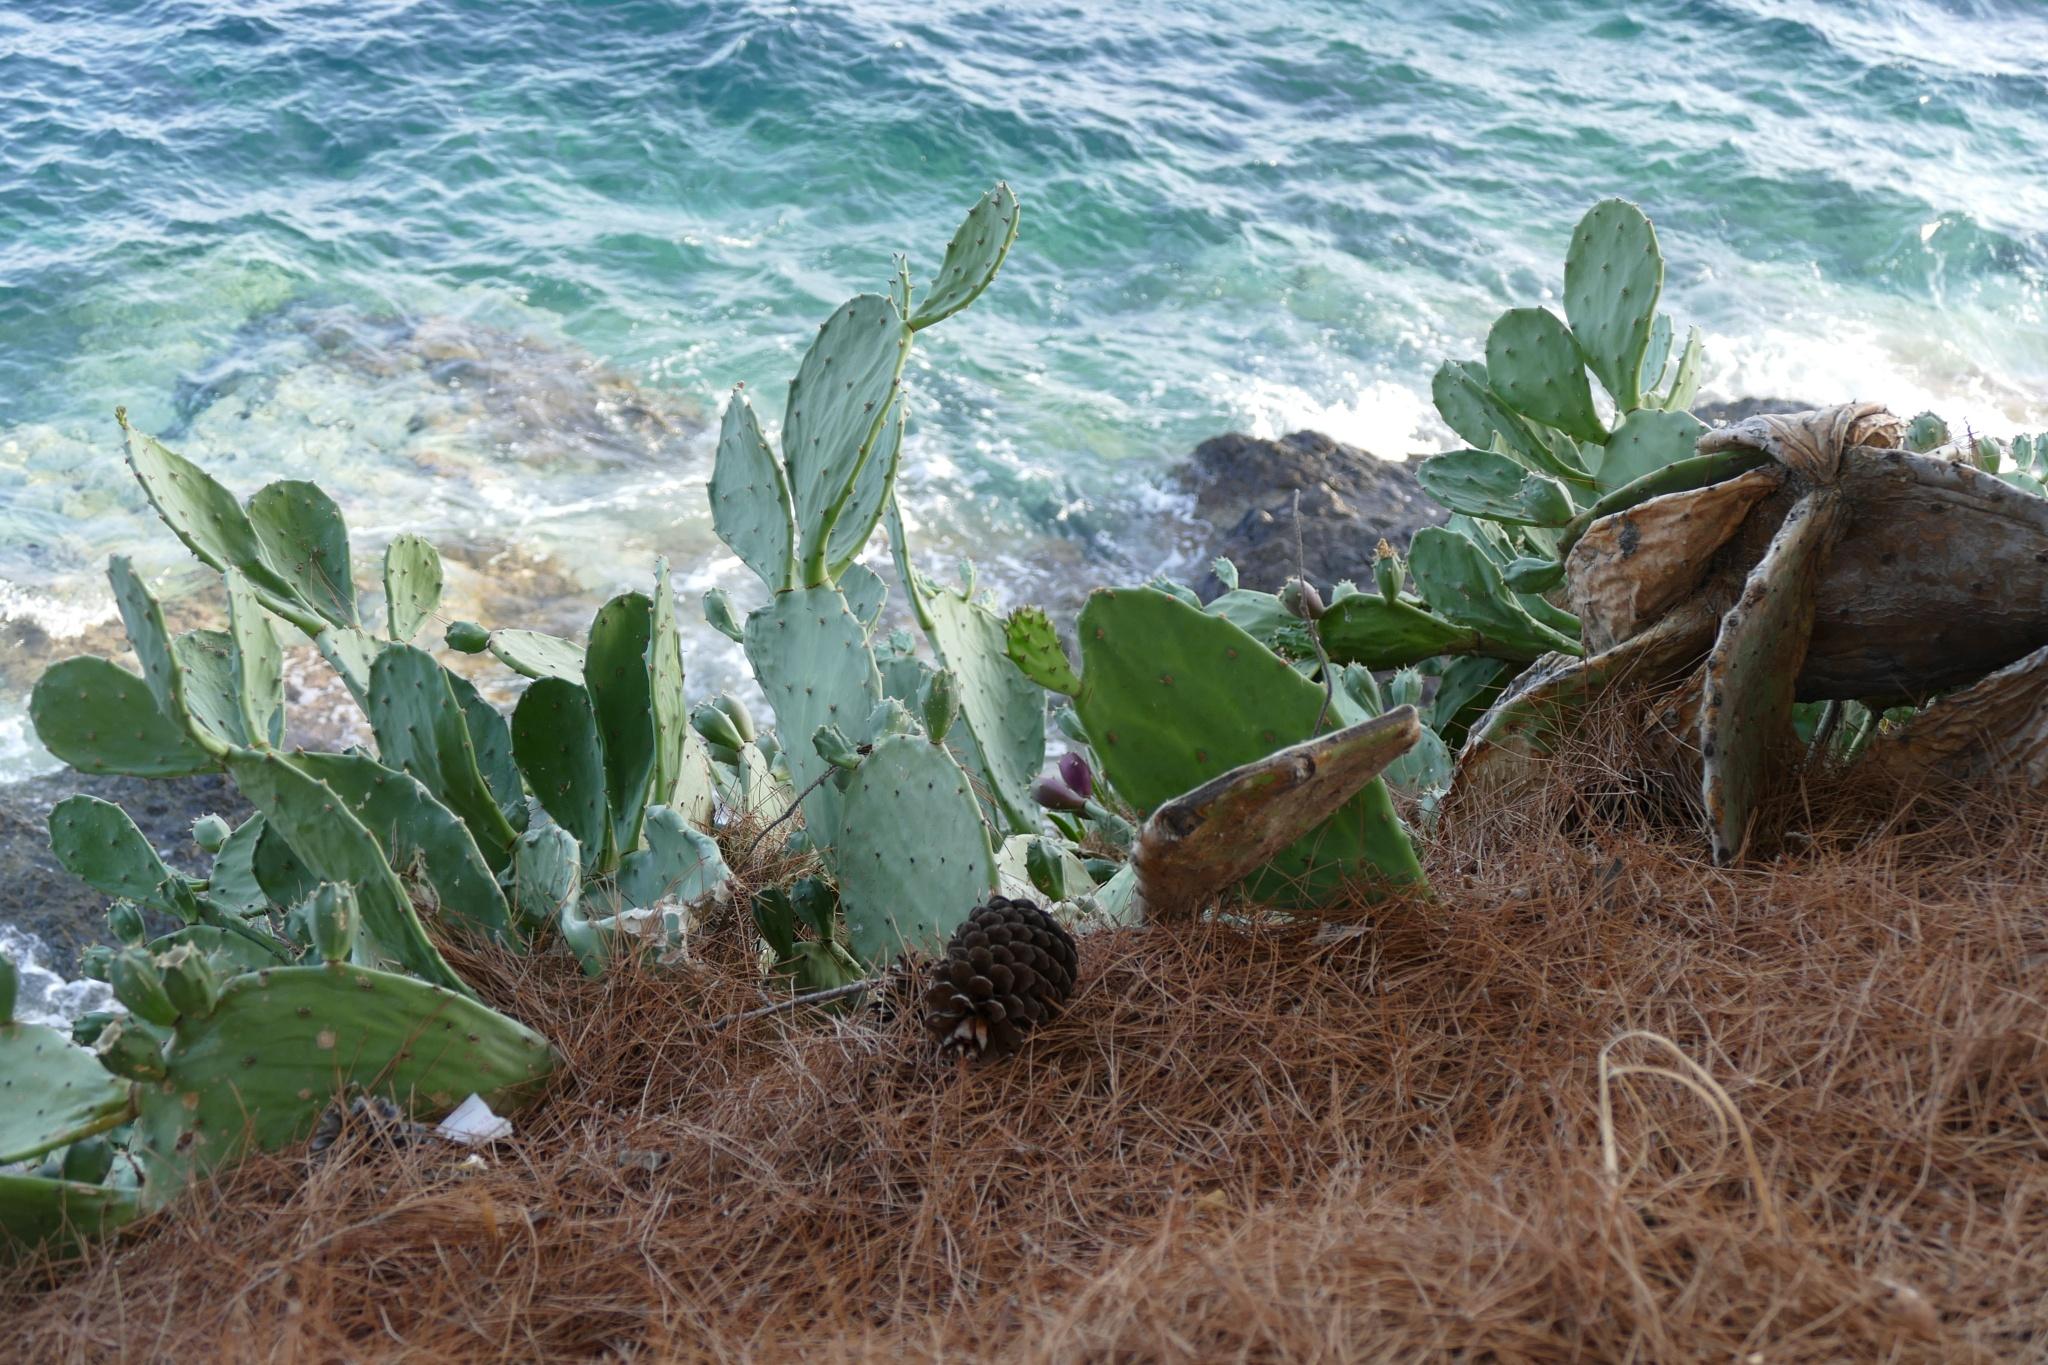 Sea and cactus by Kari